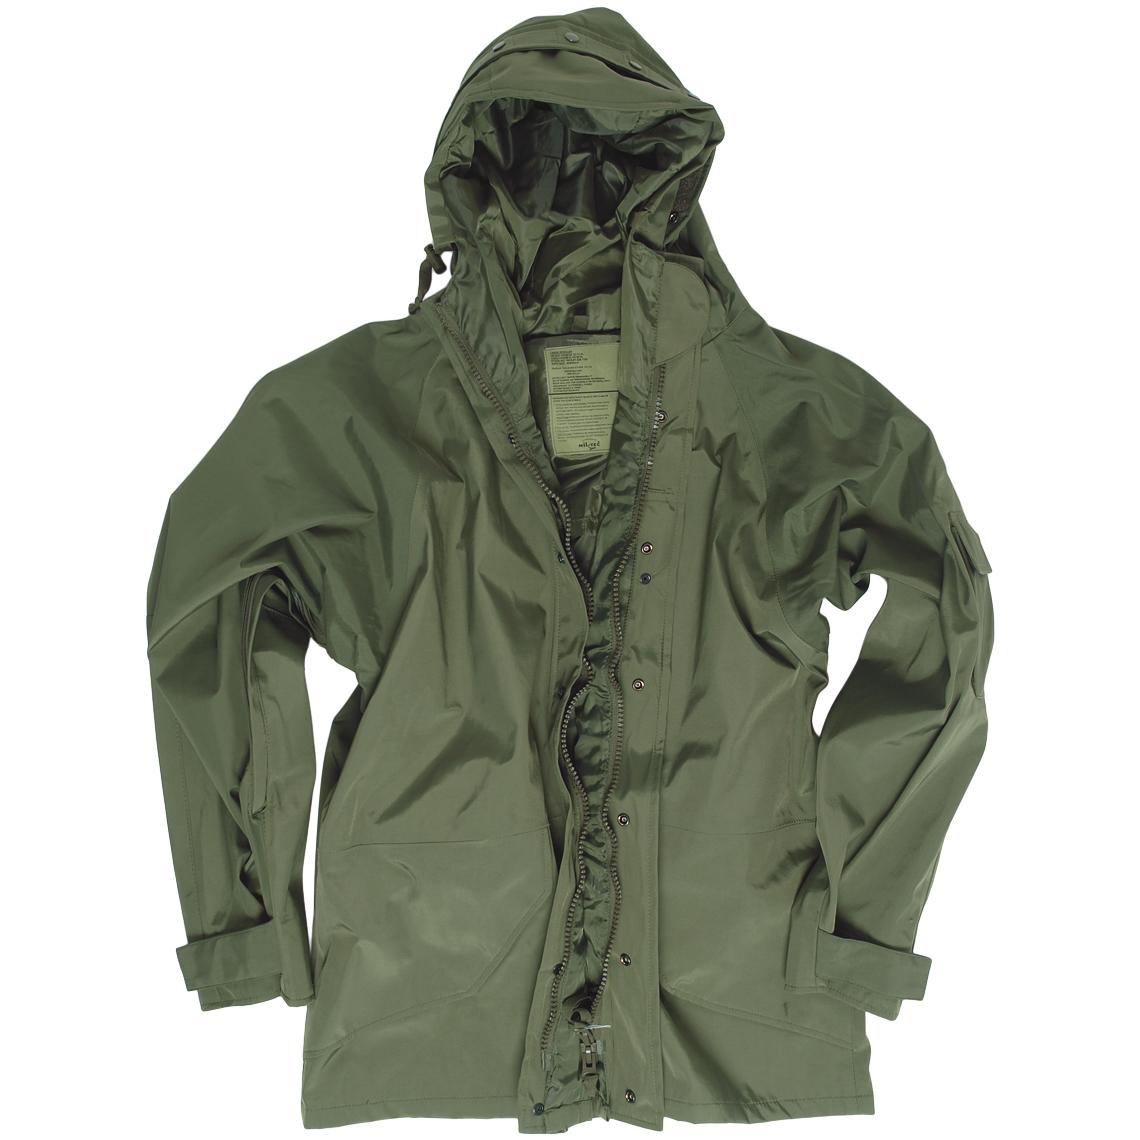 mil tec waterproof wet weather hooded jacket military hunting hiking parka olive ebay. Black Bedroom Furniture Sets. Home Design Ideas